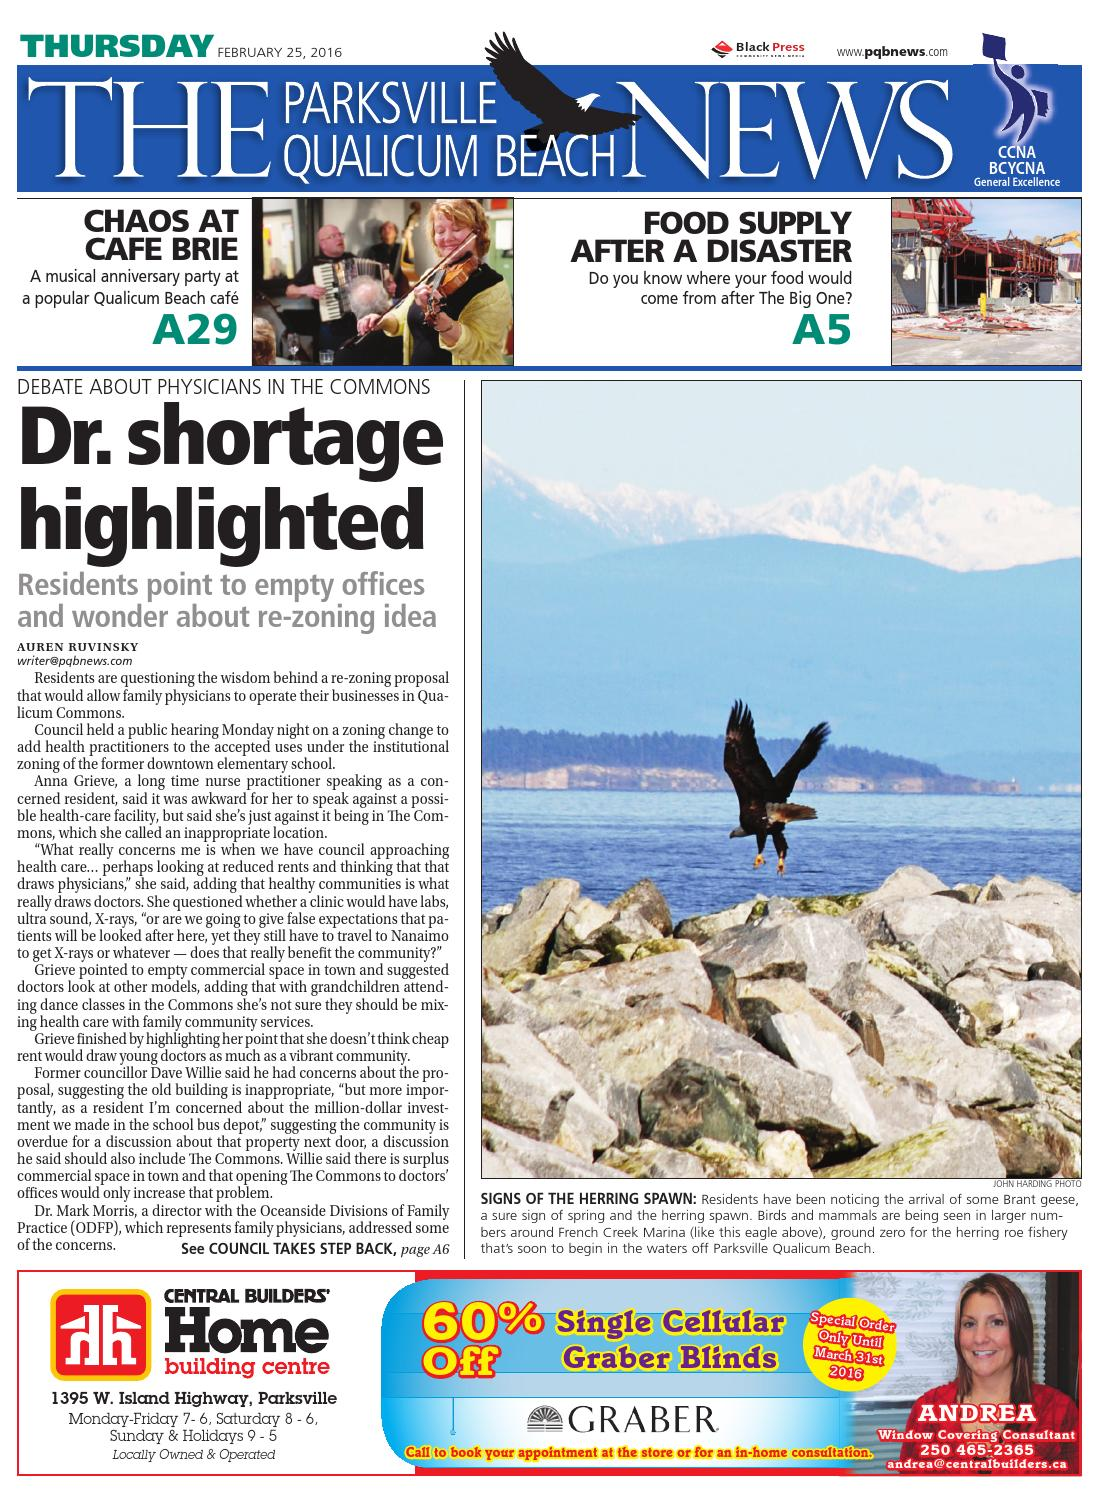 Parksville Qualicum Beach News, February 25, 2016 by Black Press